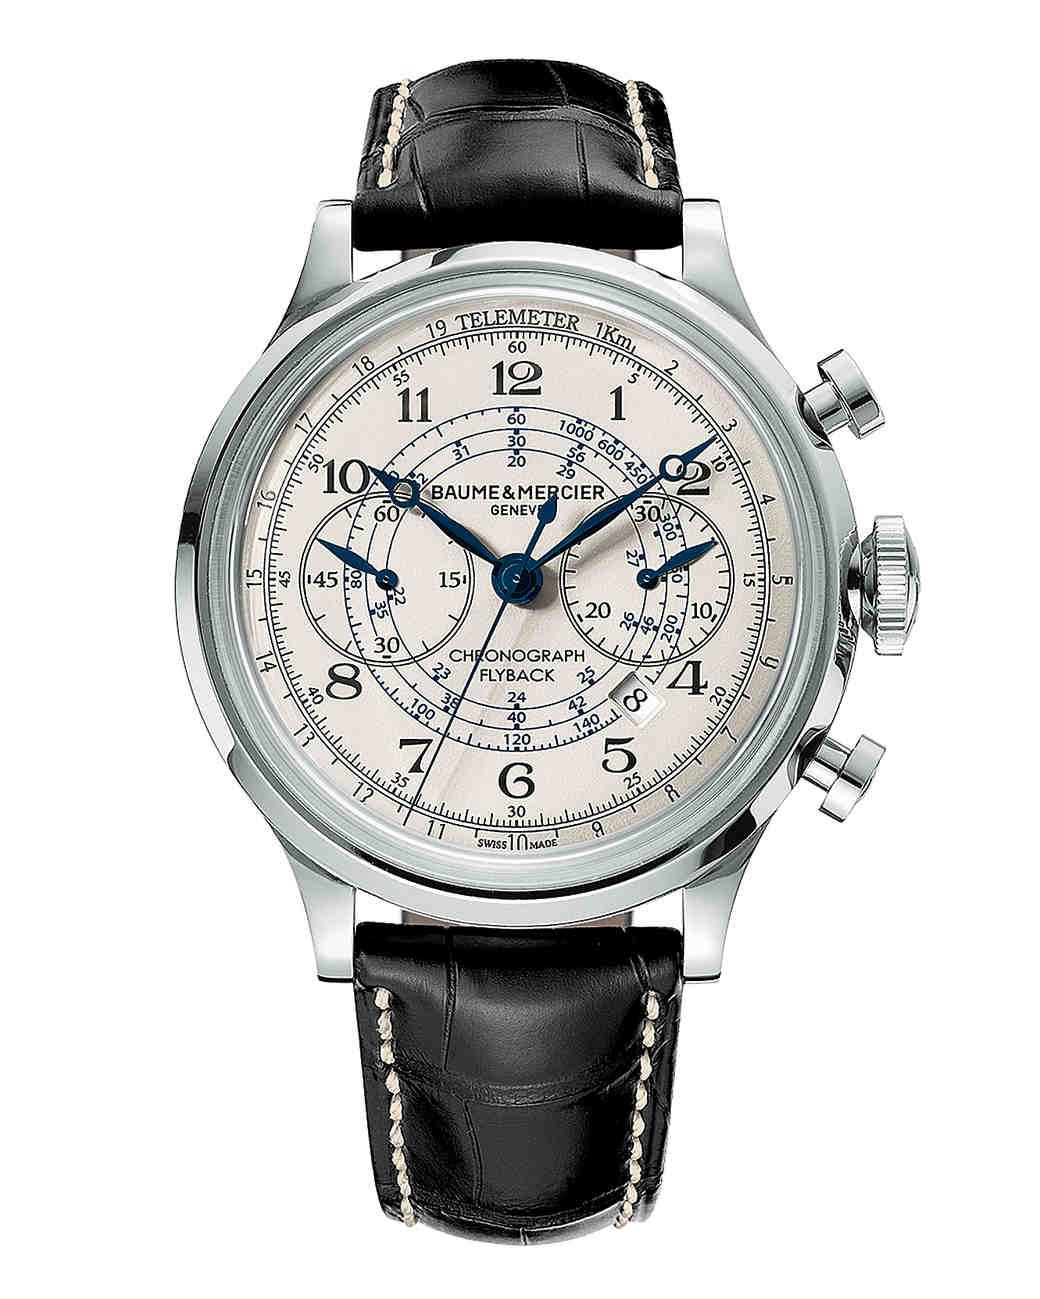 baume-mercier-watch-capeland-10006-0514.jpg